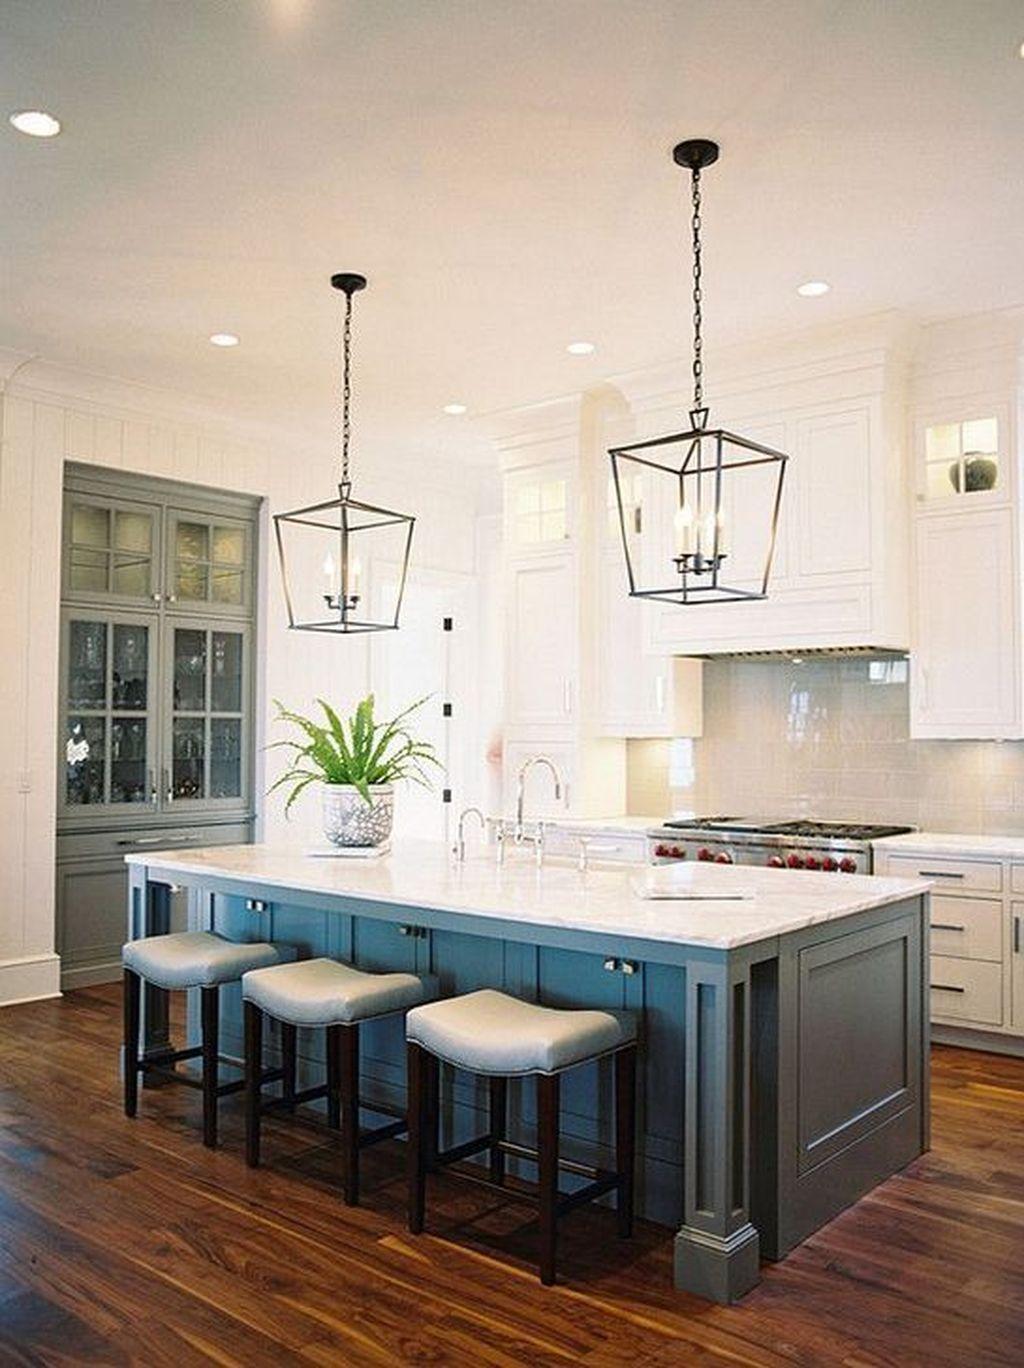 30 Awesome Nautical Kitchen Design And Decor Ideas Kitchen Island Design Kitchen Inspirations Home Decor Kitchen